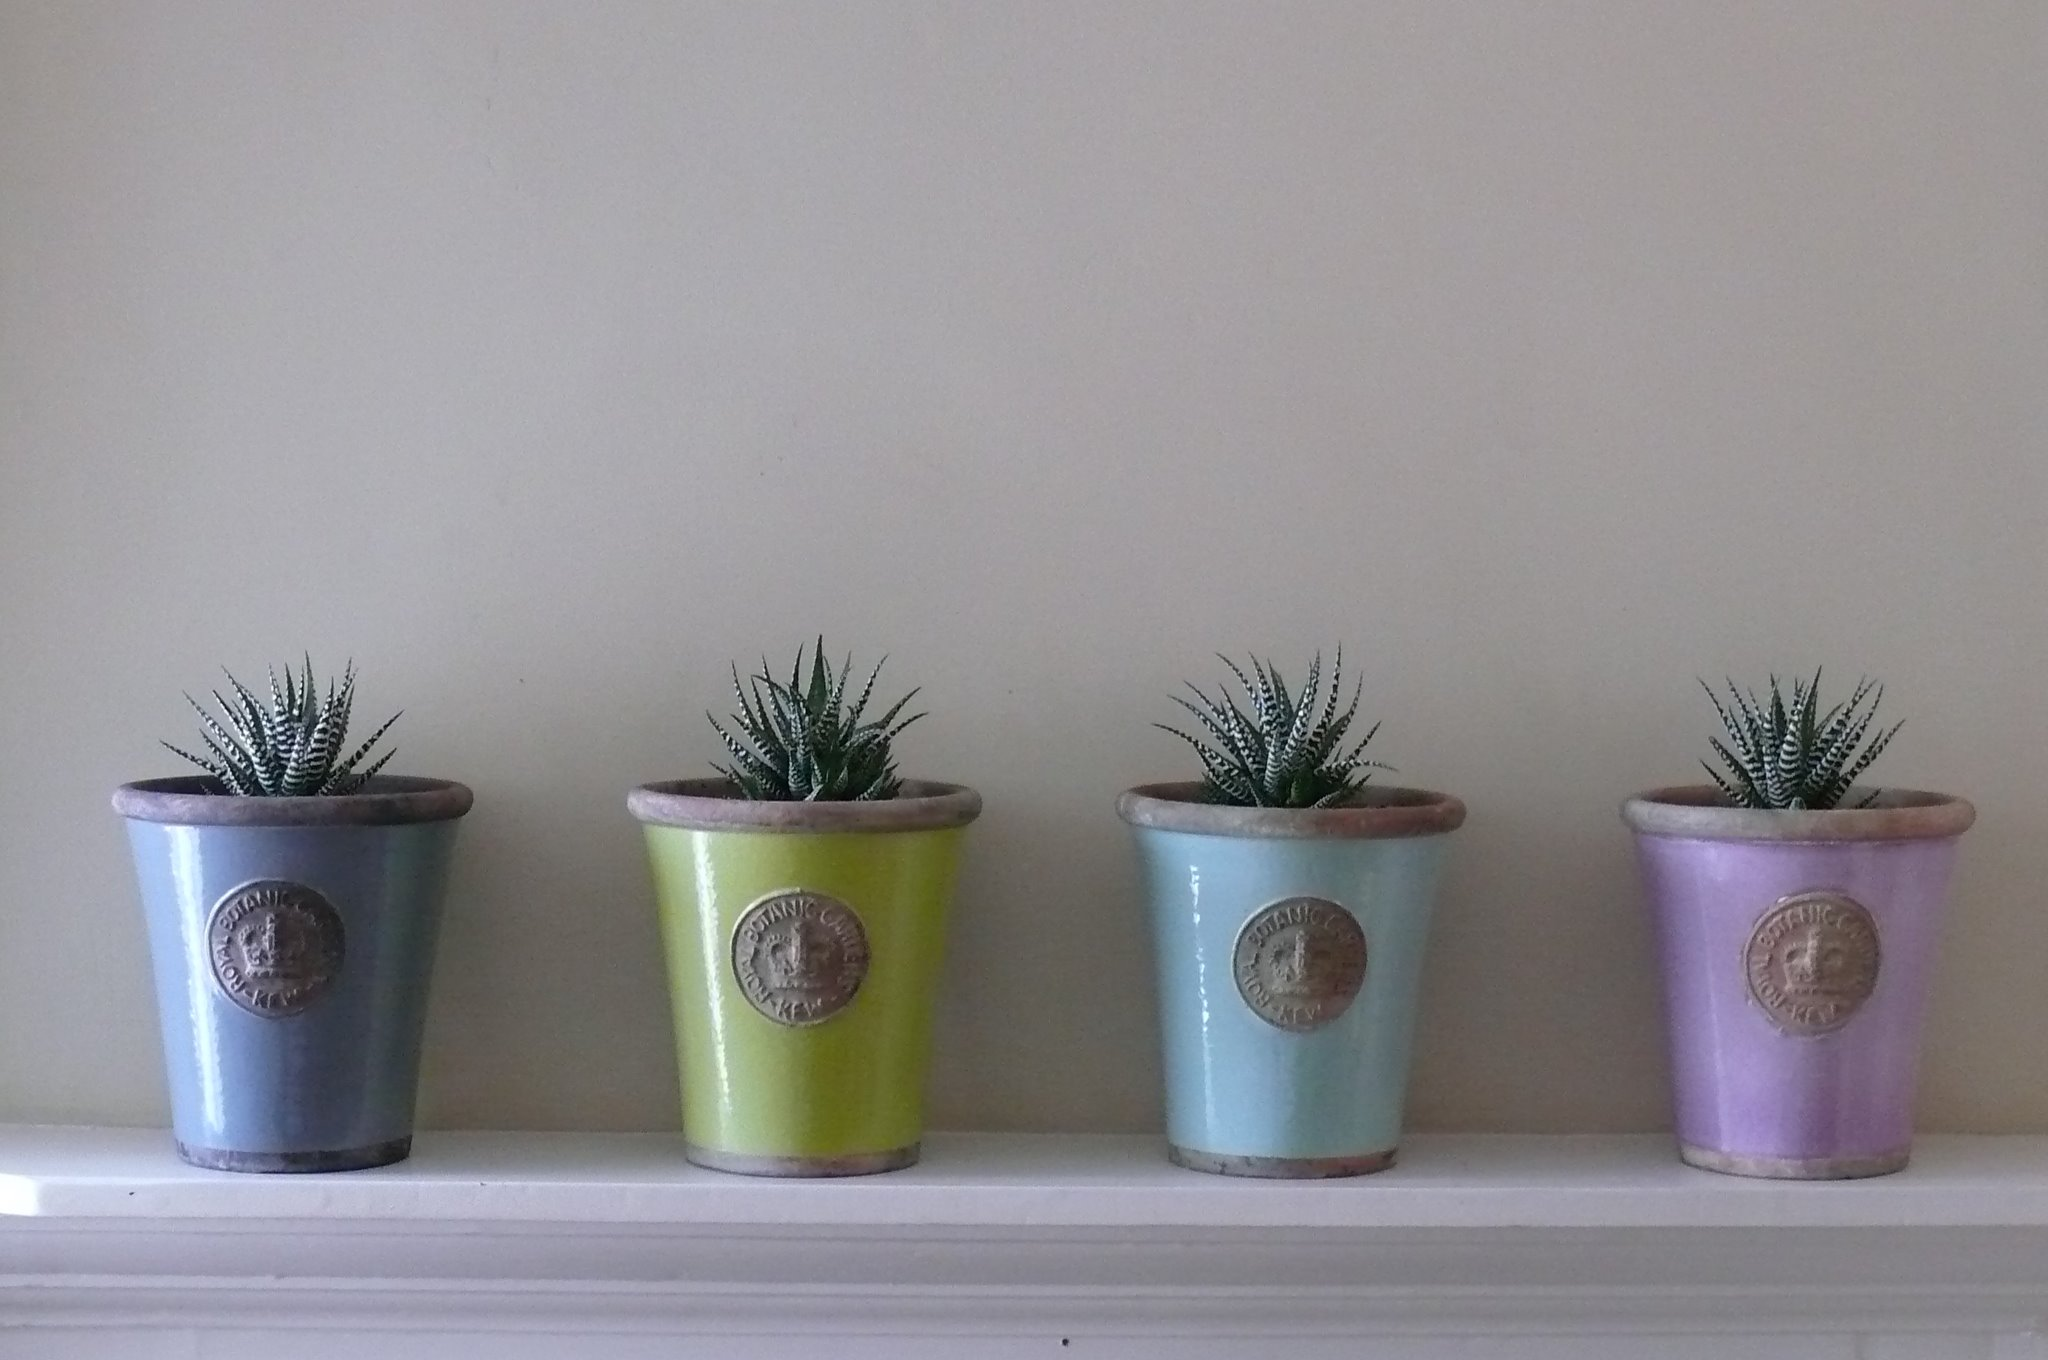 Medium Kew pots planted with Haworthias - £35 each  Empty H: 21 X W: 19CM - £22  Small H: 16 x W: 14cm - £13  Large H: 25 x W: 22cm - £26